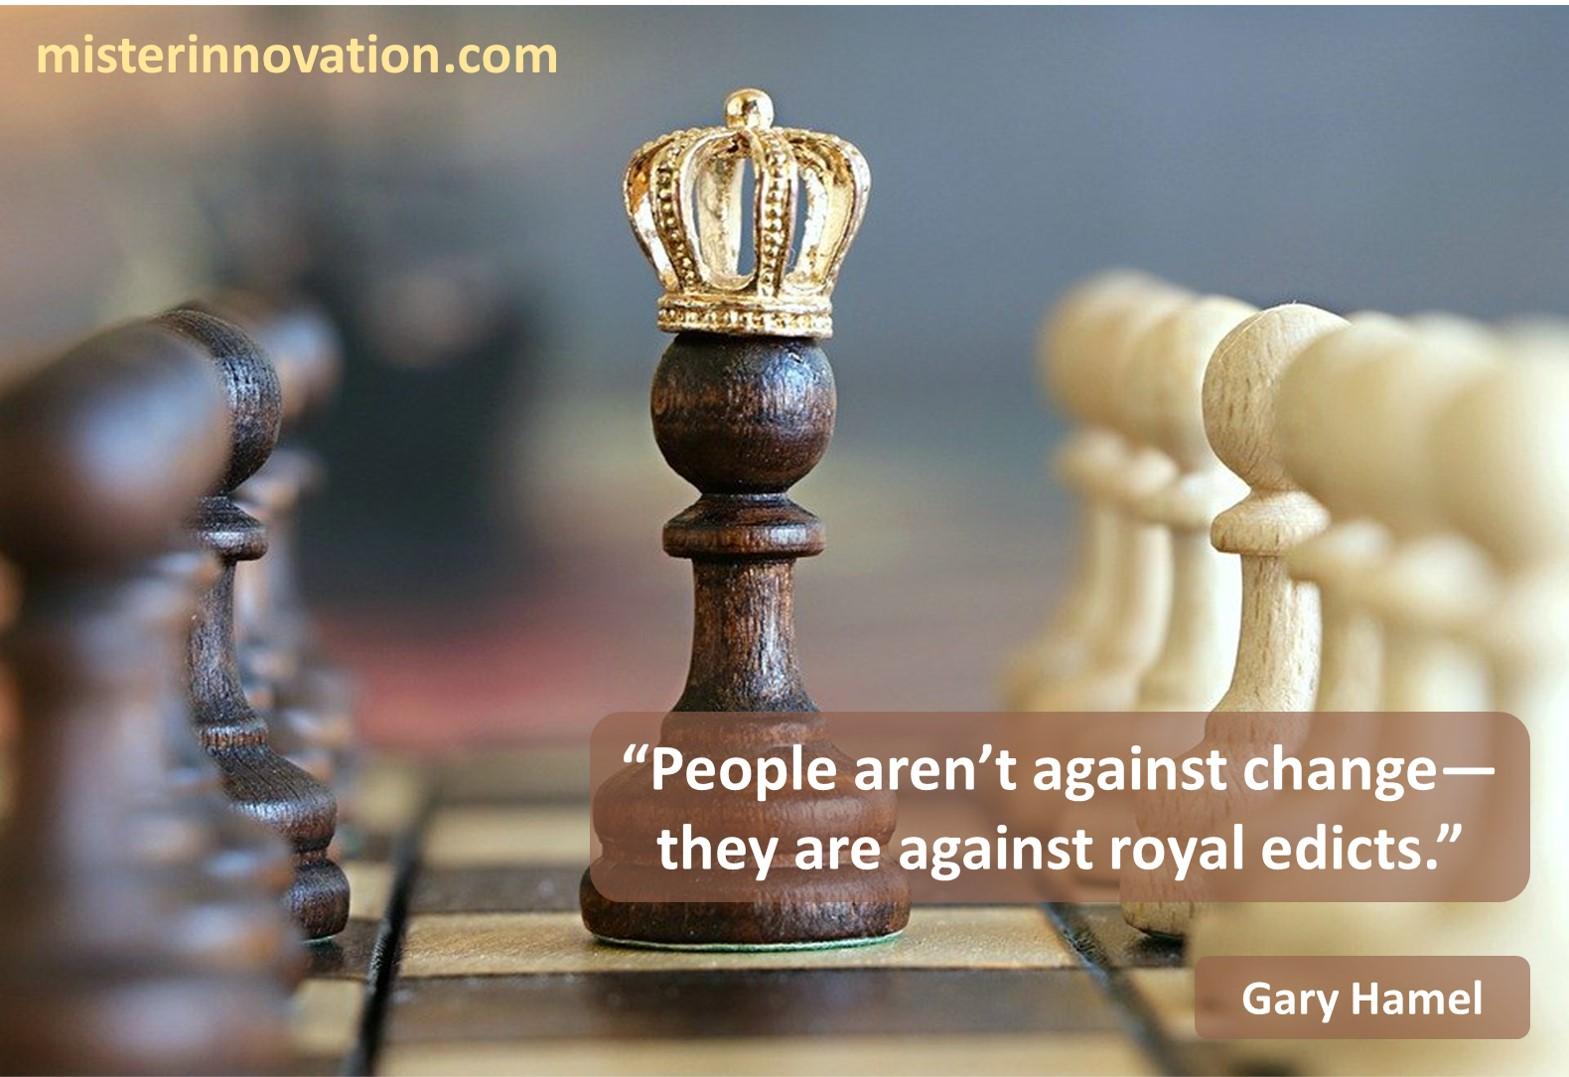 Gary Hamel Change Royal Edicts